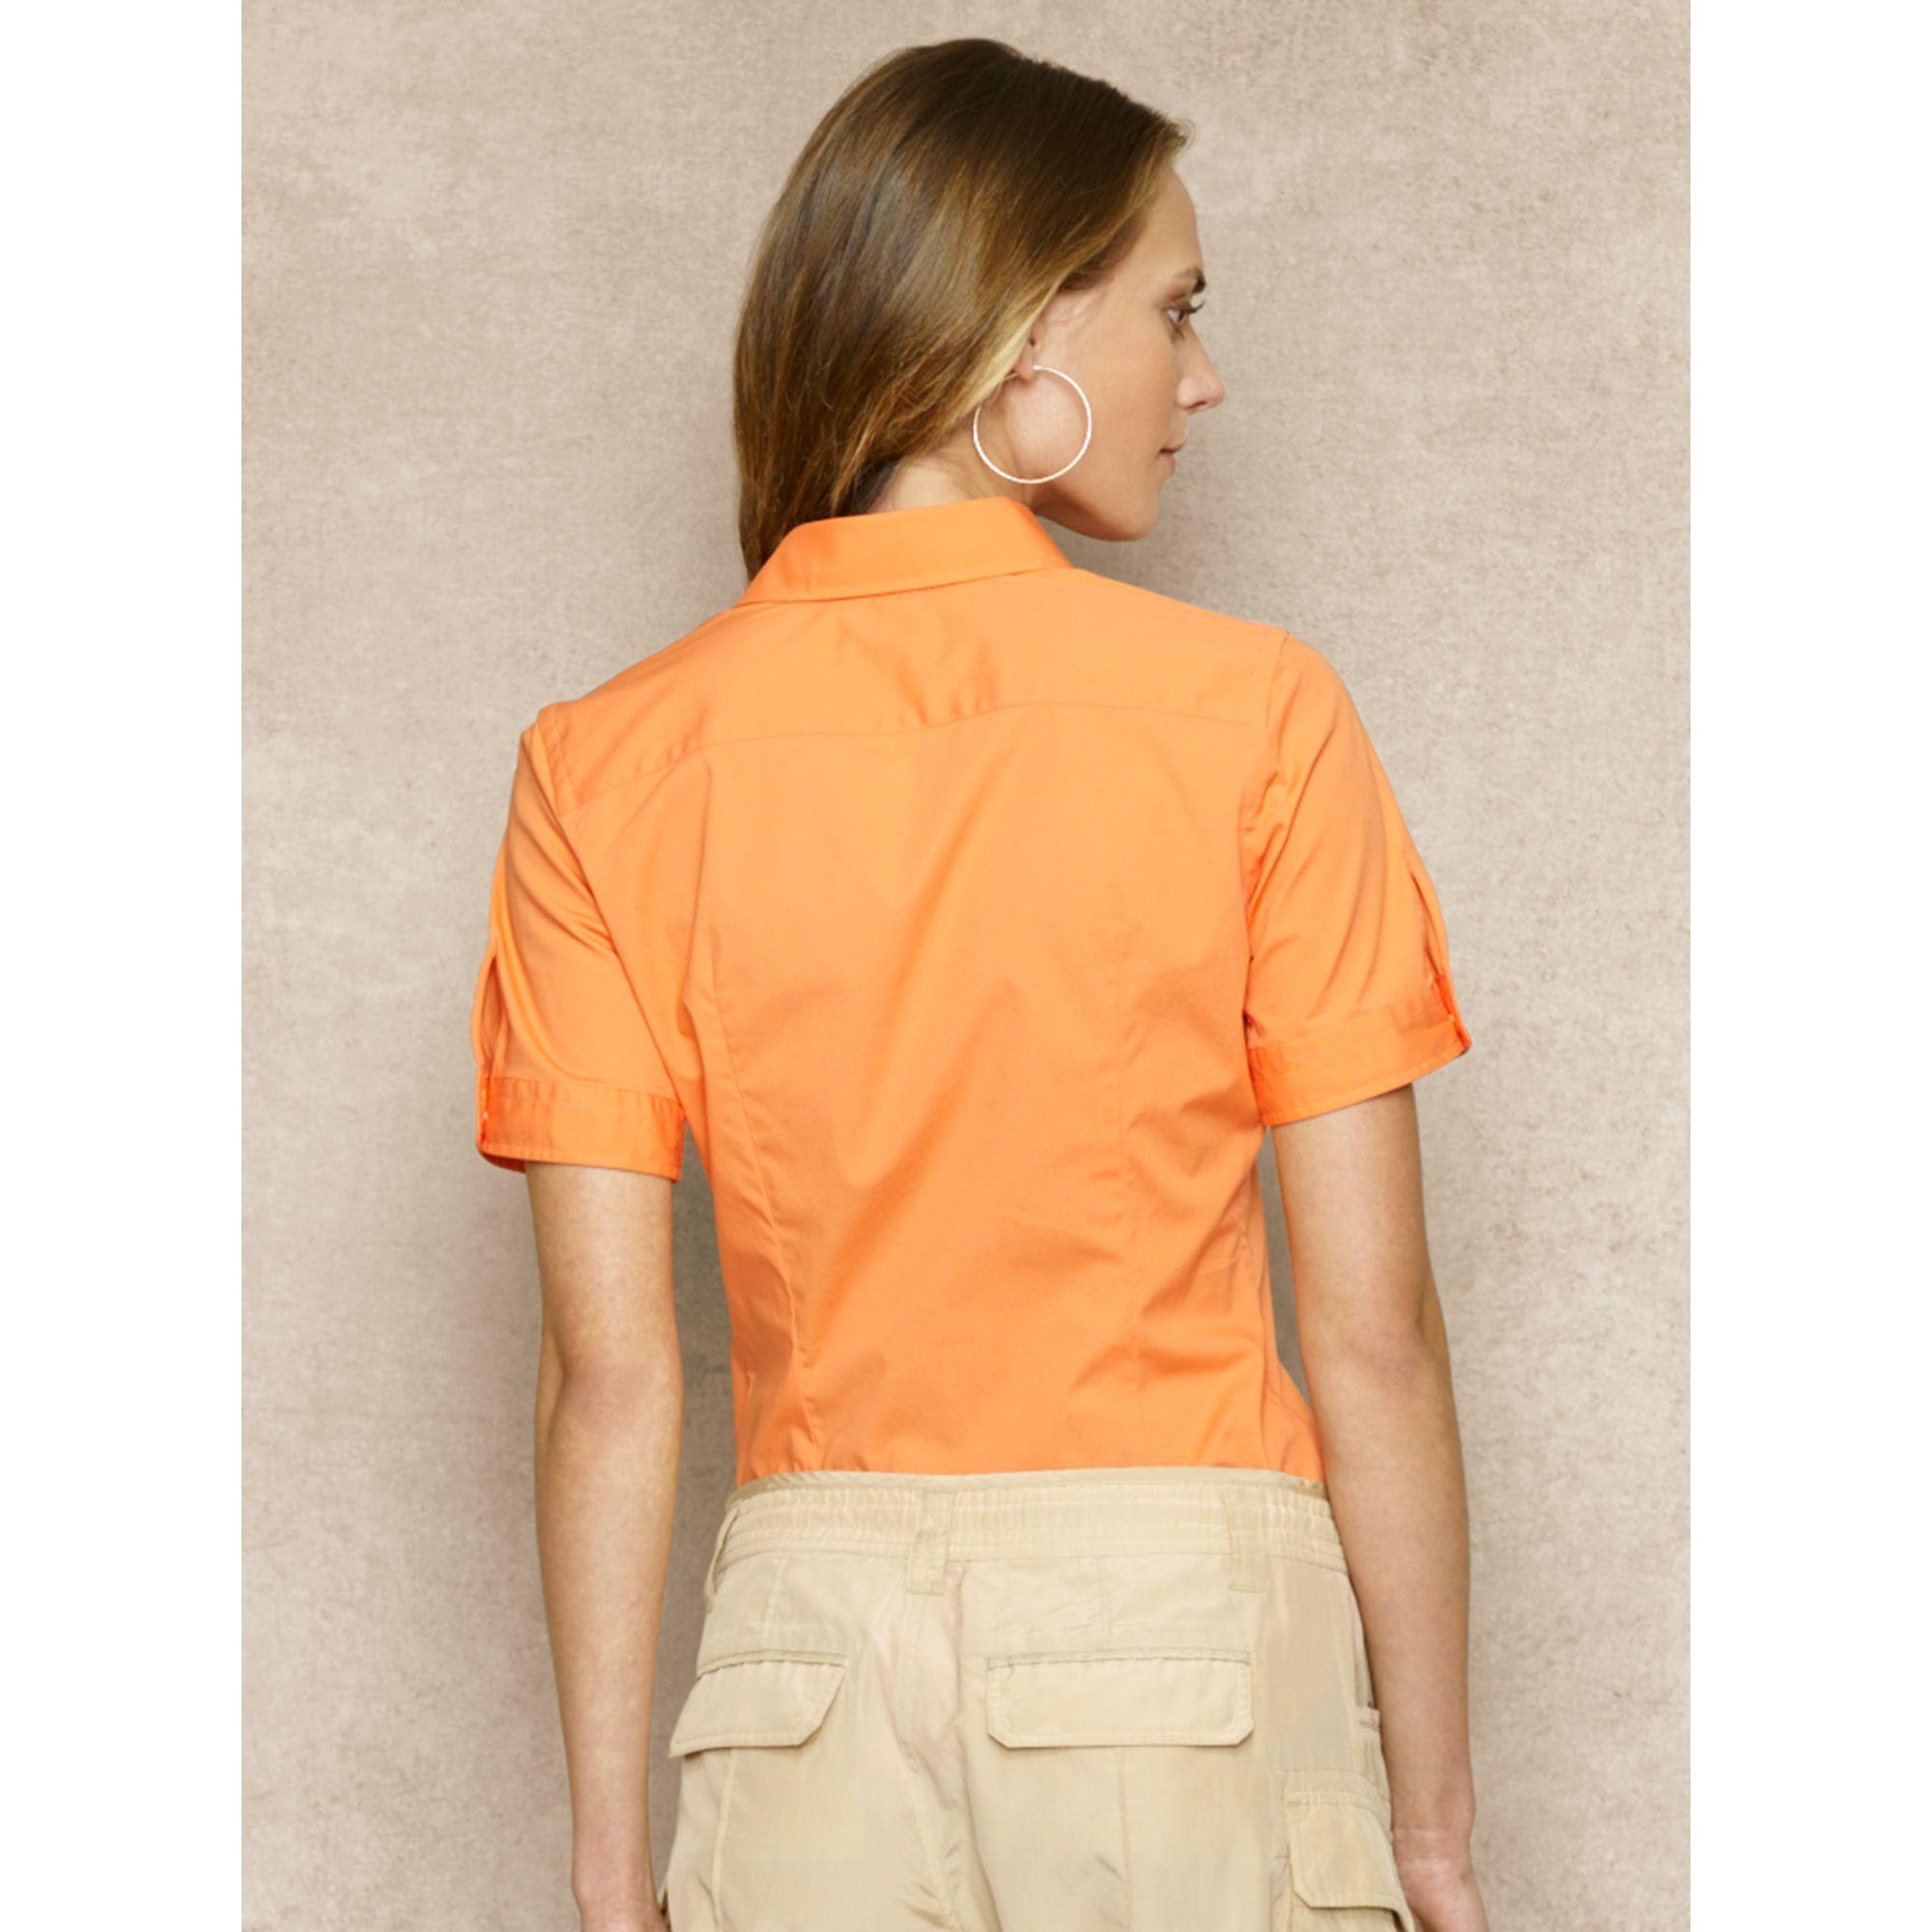 Ralph Lauren Blue Label Super Slim Fit Stretch Shirt In